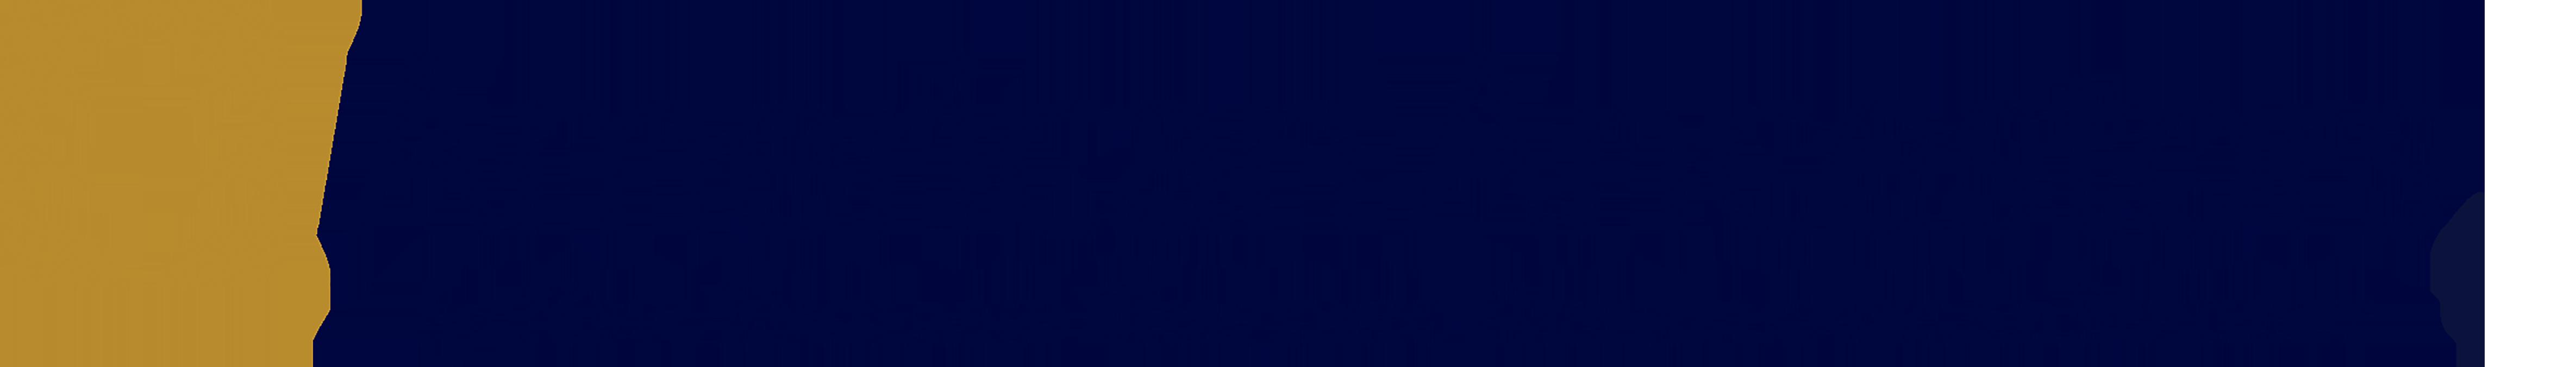 American Ancestors by NEHGS logo